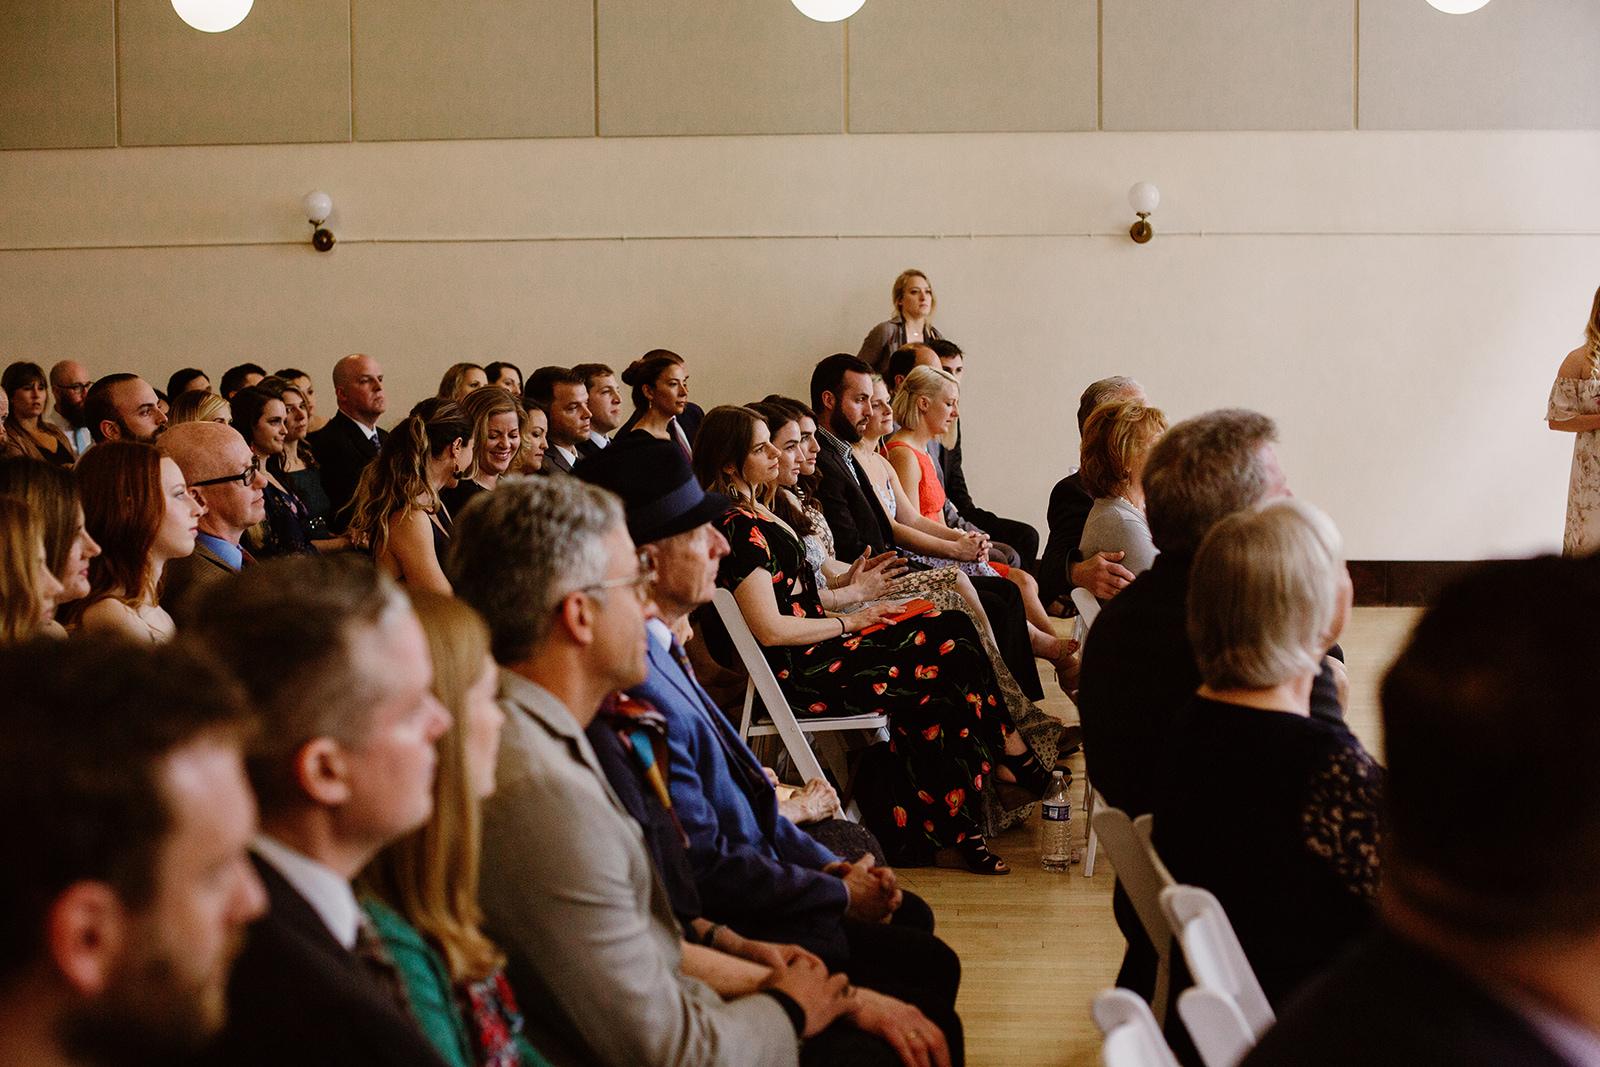 Blair_Vince-Ceremony-111.jpg